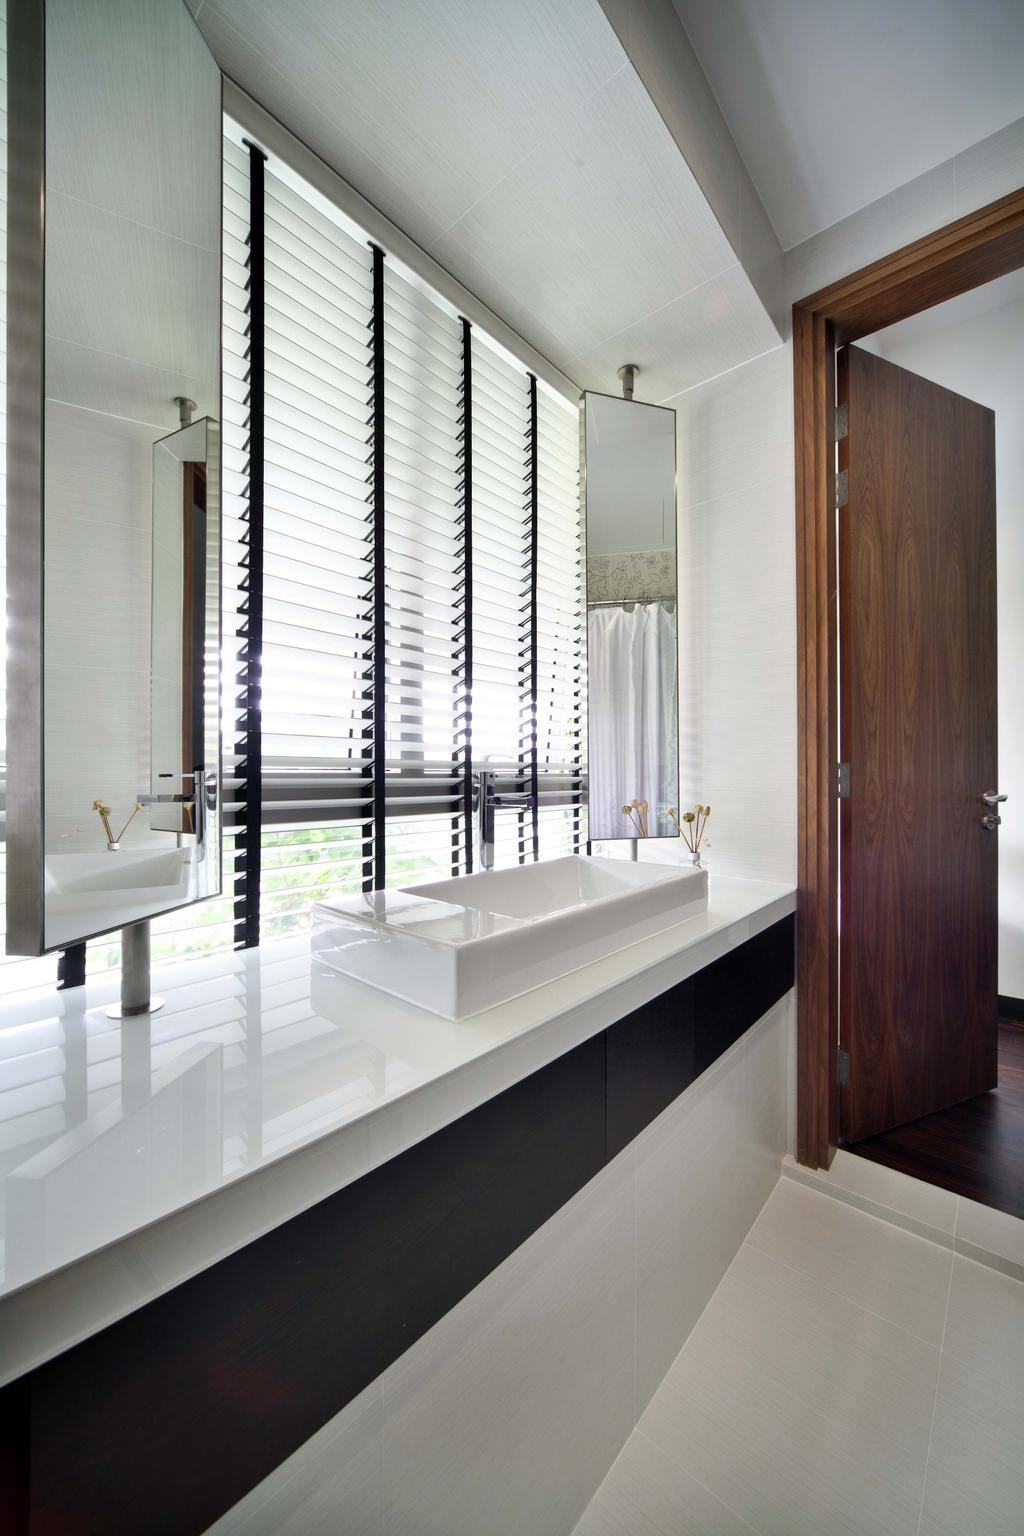 Contemporary, Condo, Bathroom, Jardin, Interior Designer, The Scientist, Venetian Blinds, Blinds, Vanity Basin, Long Mirrors, Indoors, Interior Design